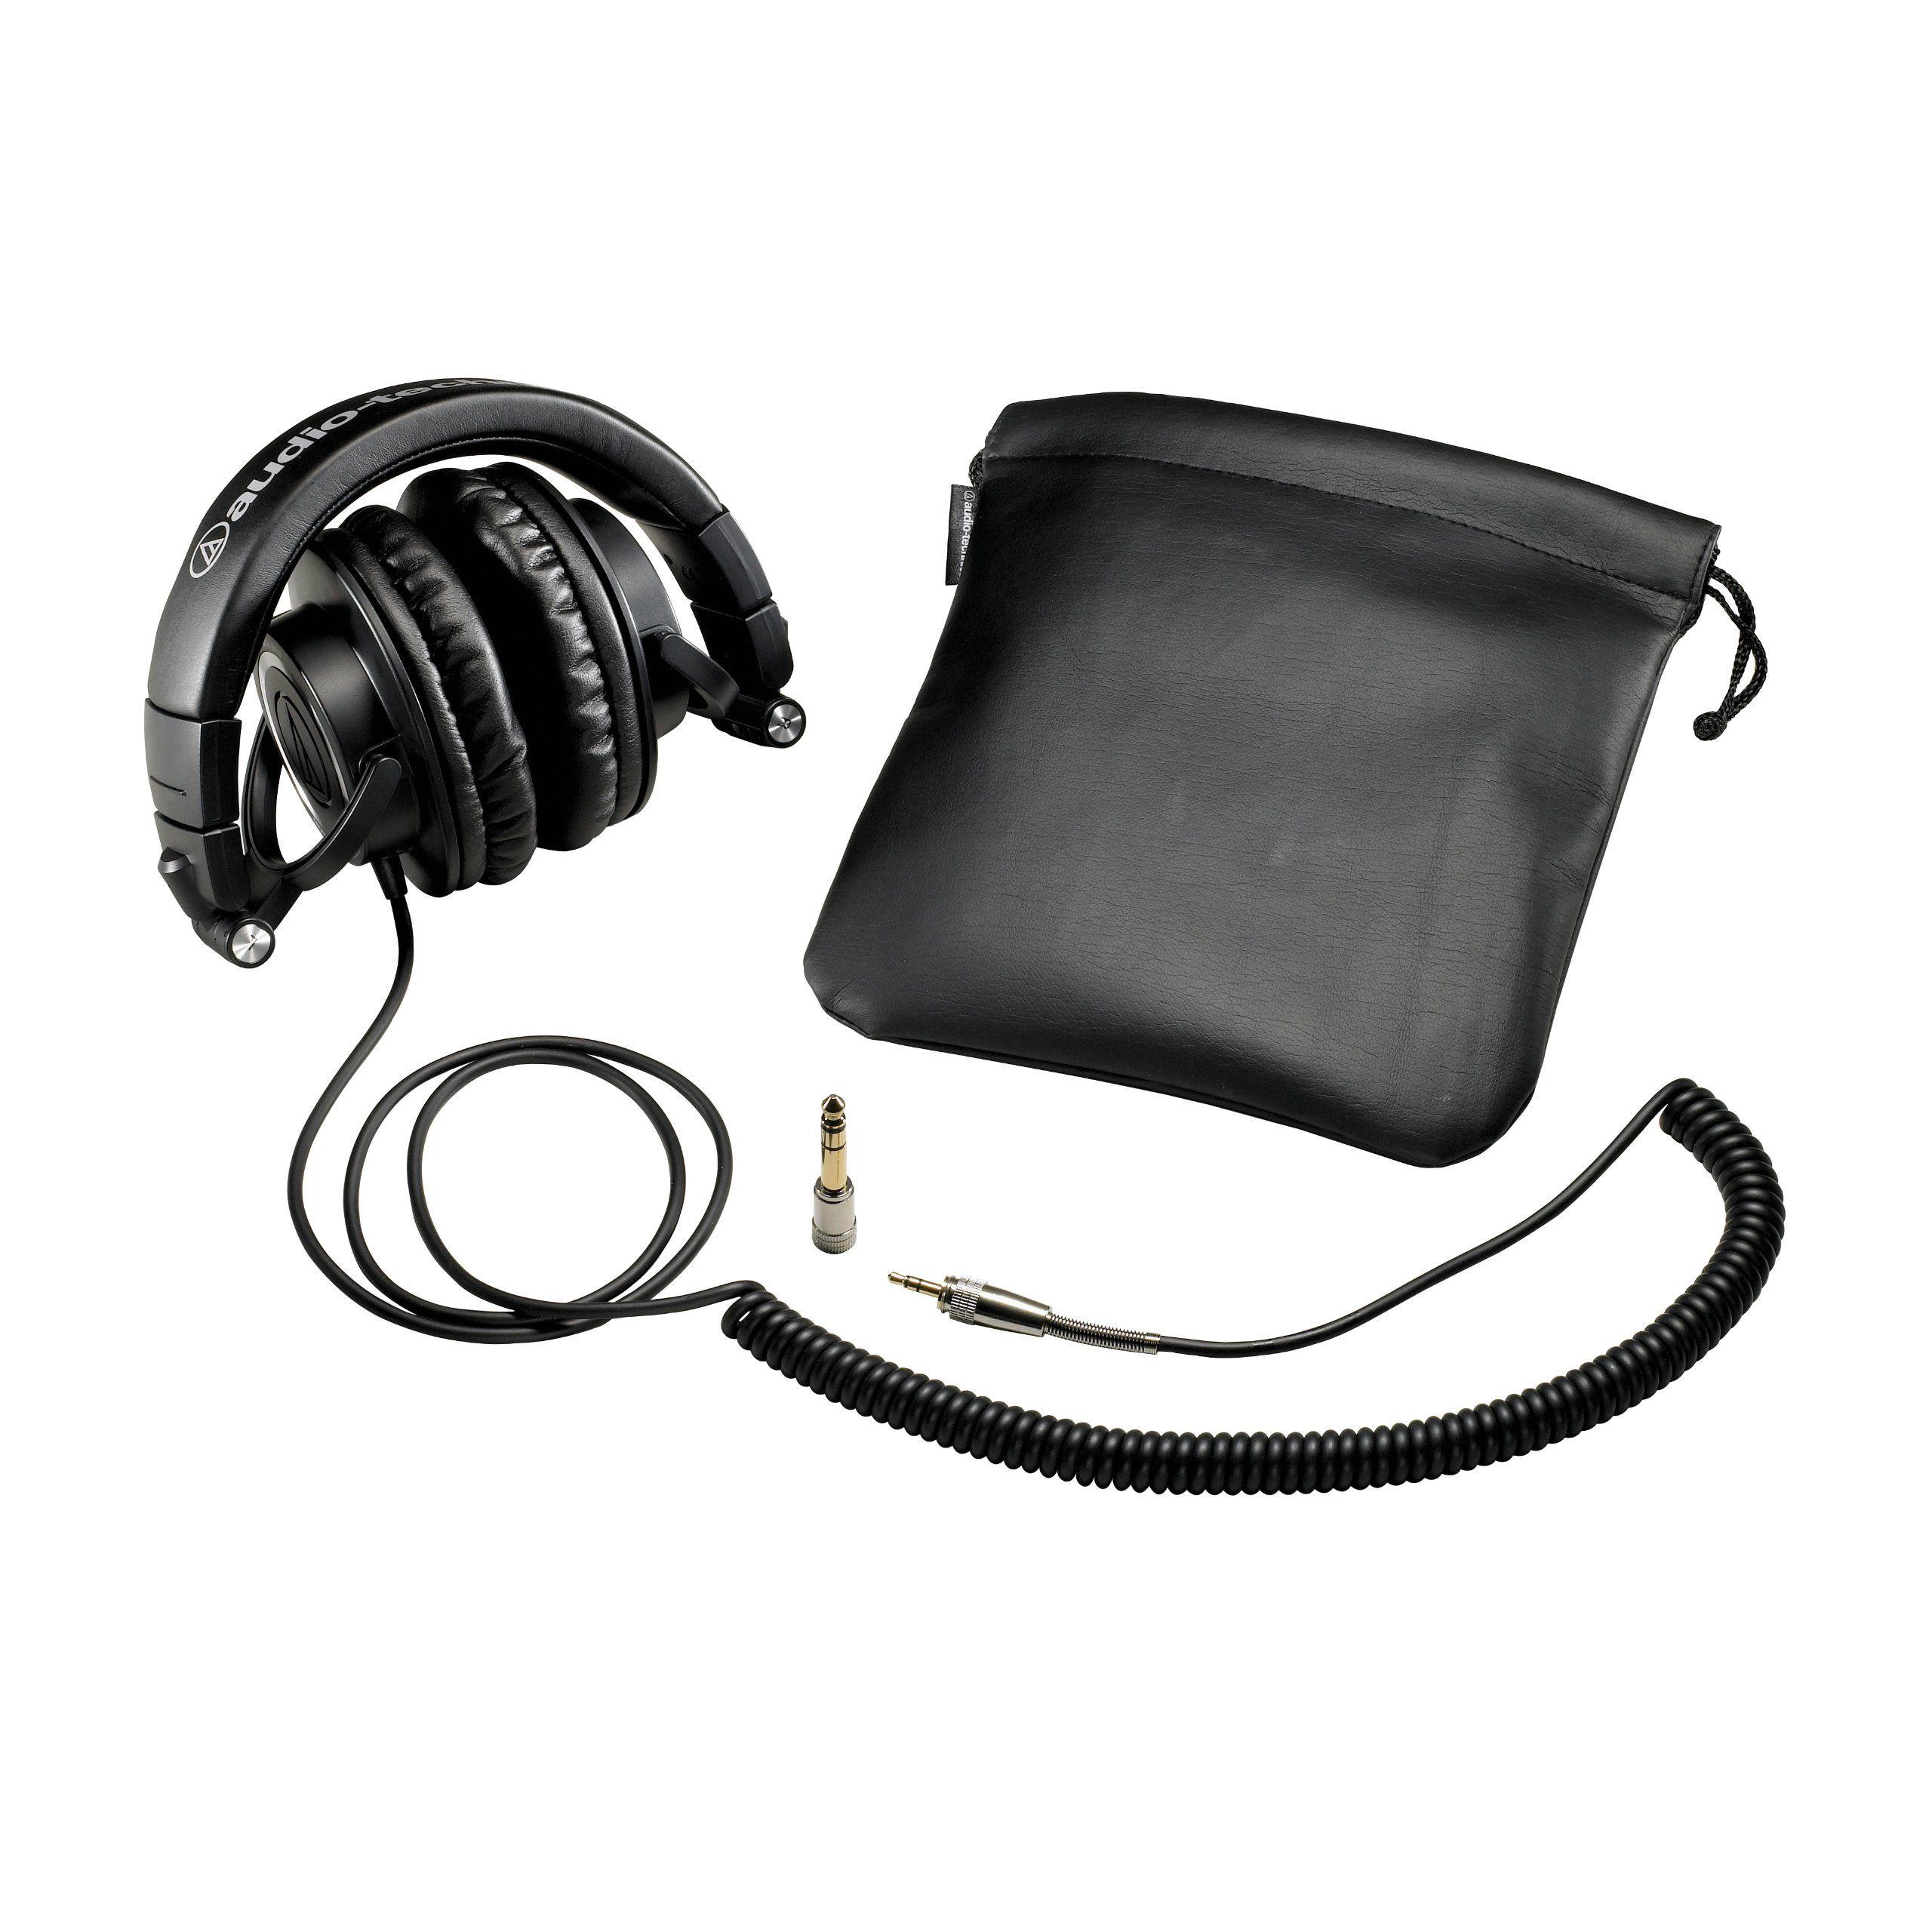 Amazon Com Audio Technica Ath M50 Professional Studio Monitor Headphones Musical Instruments Audio Technica Headphones Audio